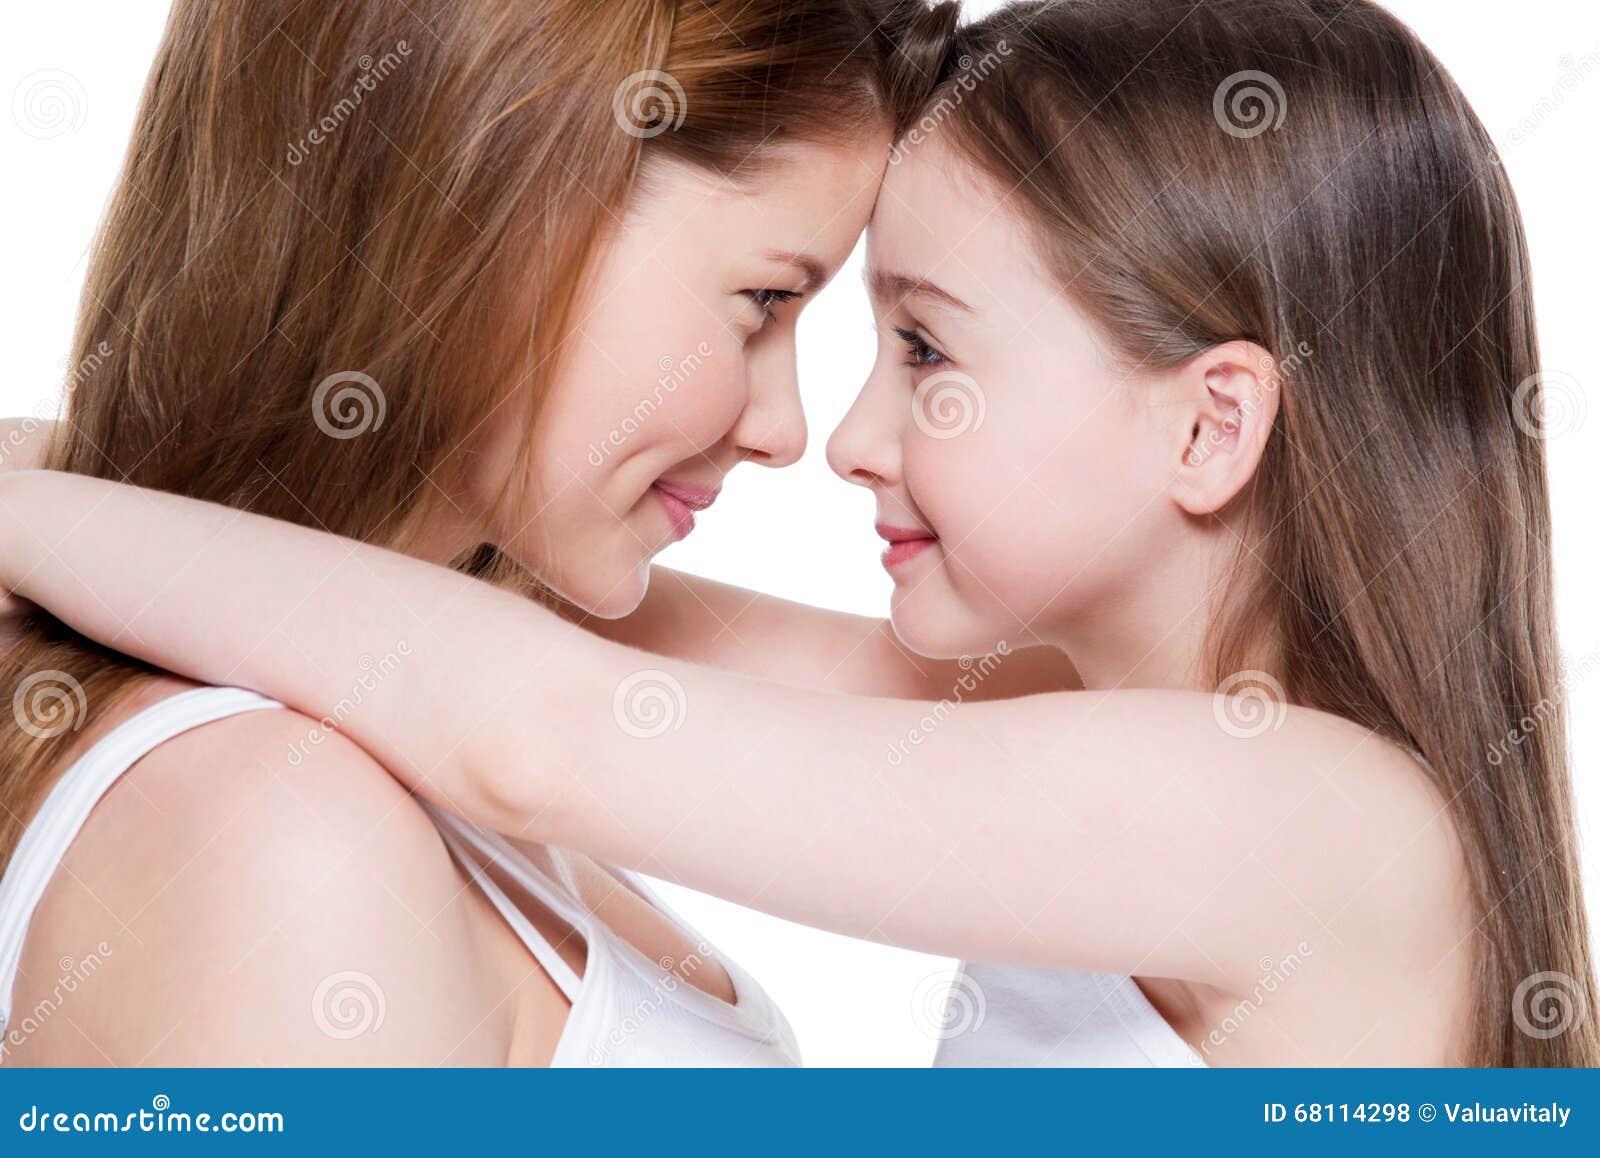 Nude teen girl and mom lesbian porn